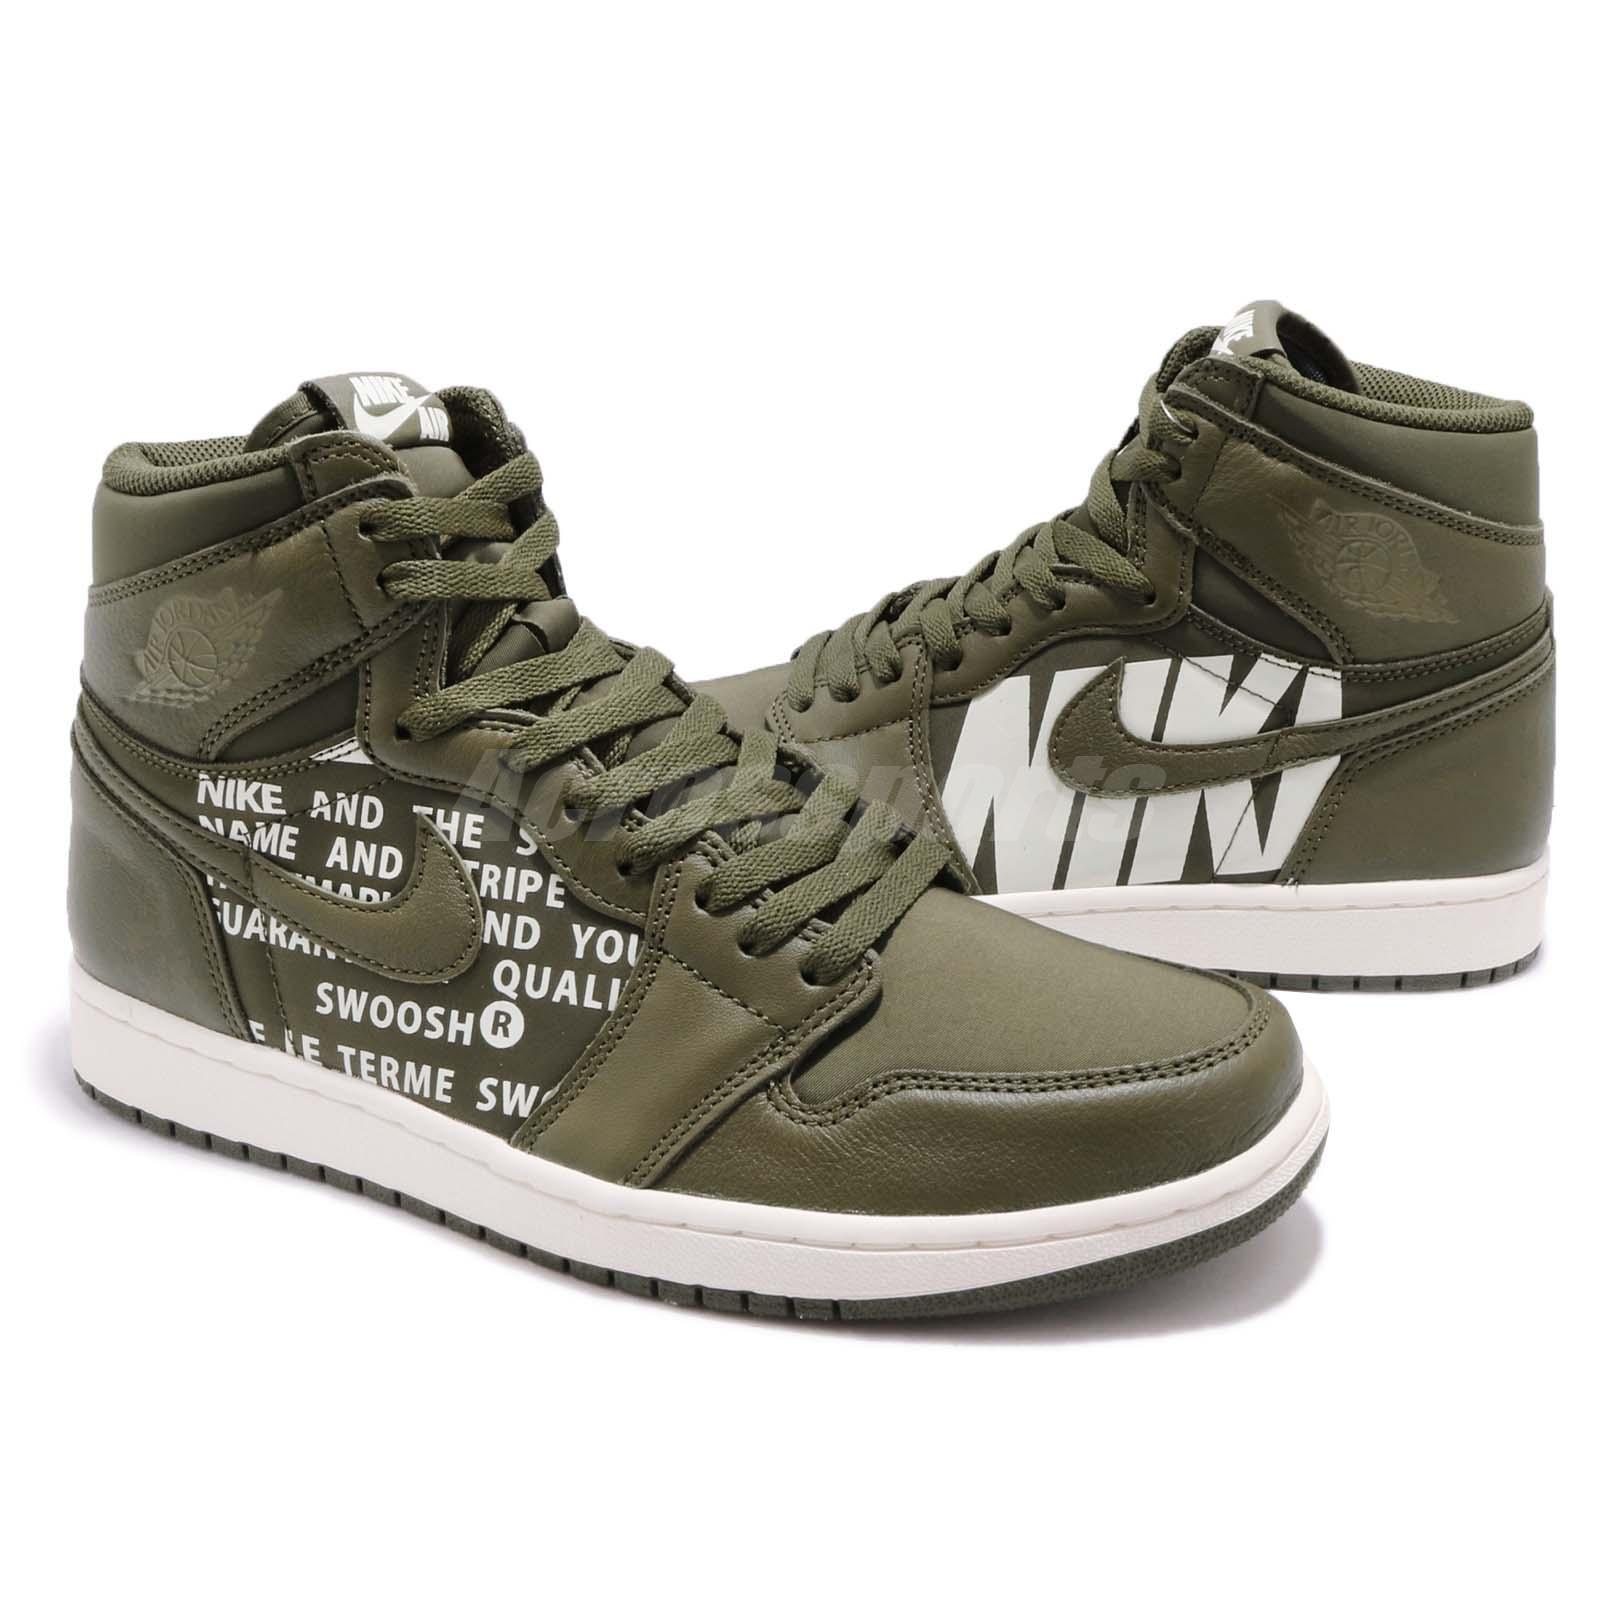 differently 2ffcd d6f1d Nike Air Jordan 1 Retro High OG Big Logos Olive Canvas Sail AJ1 Men ...